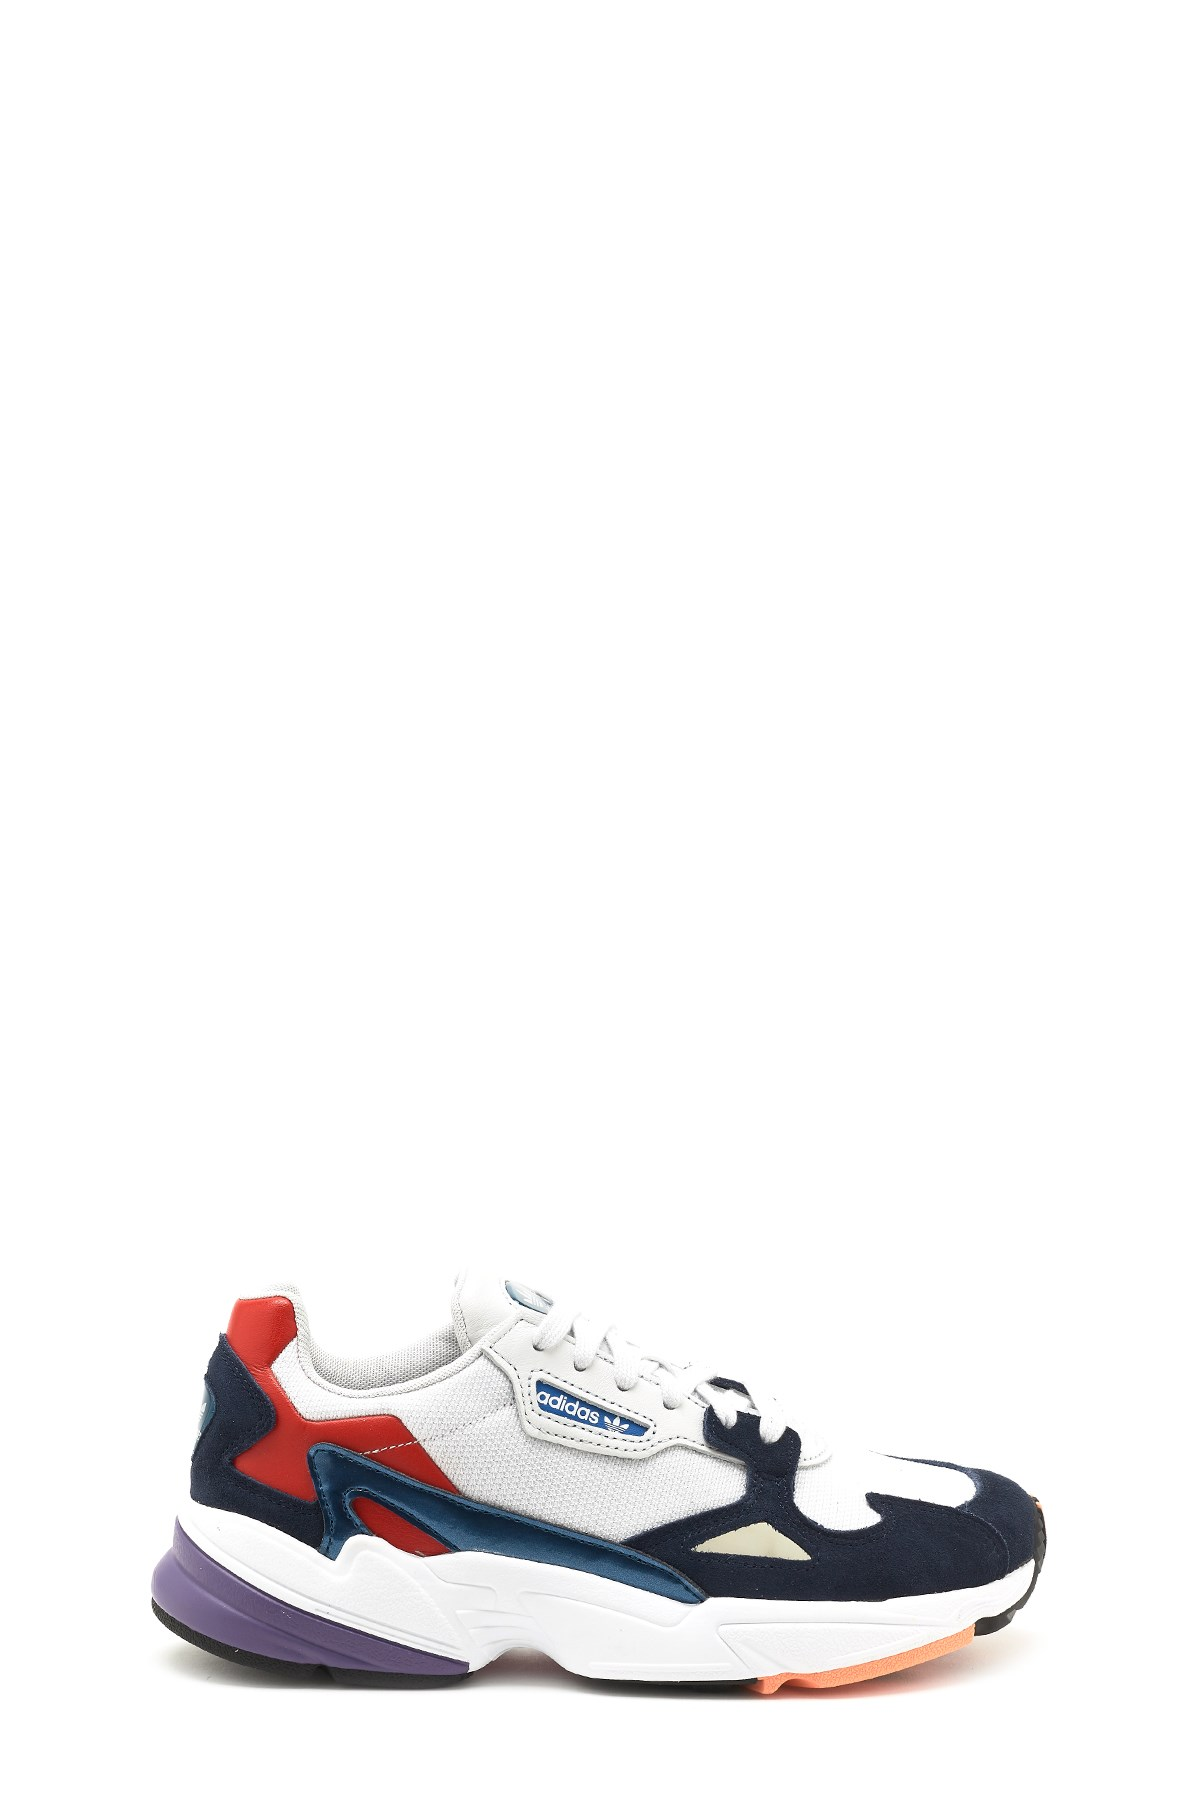 77932ca700521f adidas originals  Falcon w  sneakers available on julian-fashion.com ...